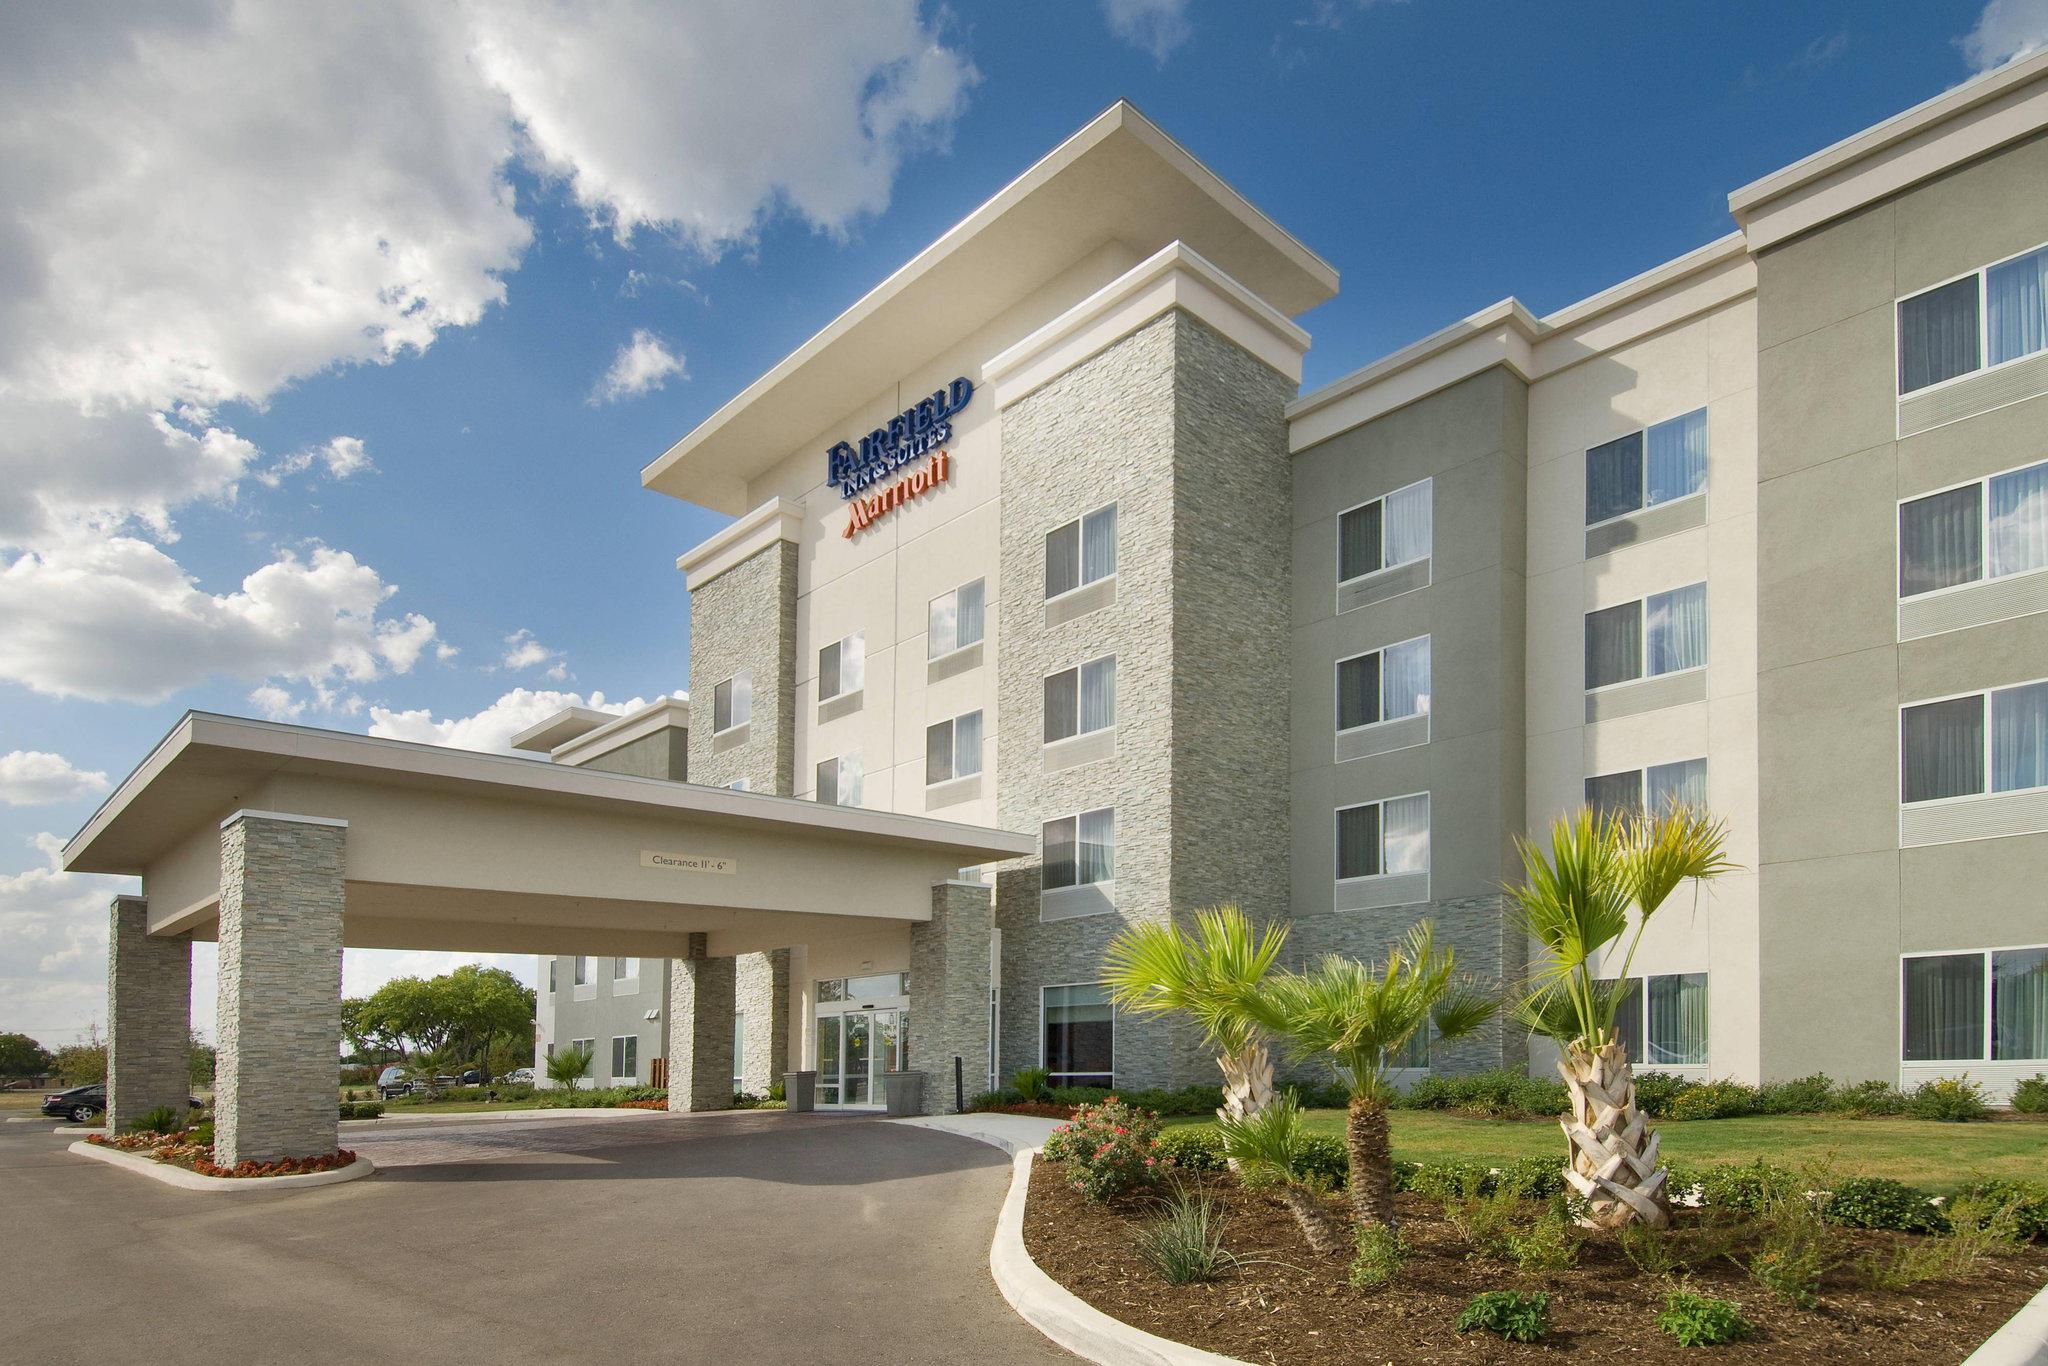 Fairfield Inn & Suites by Marriott New Braunfels